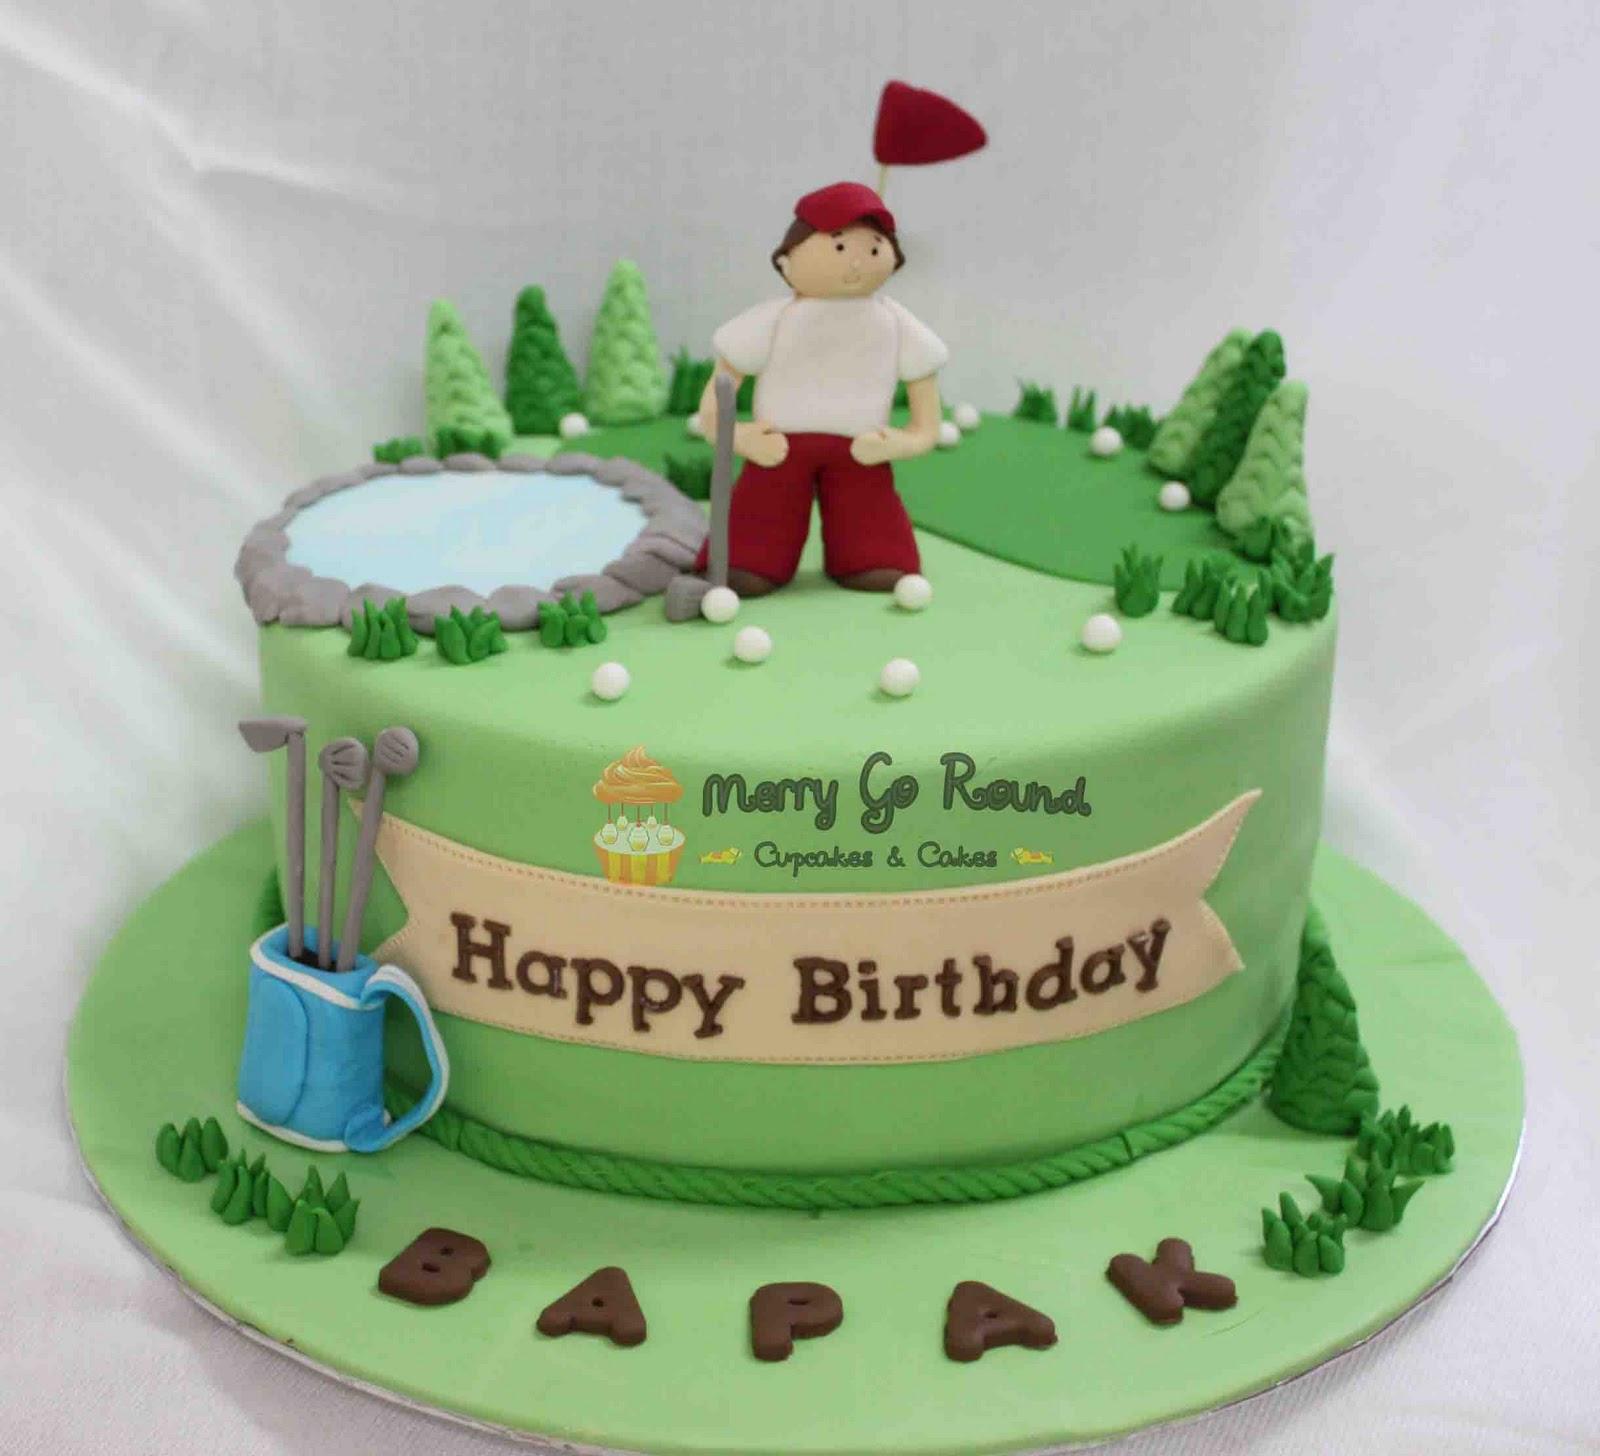 Merry Go Round Cupcakes Cakes Golf Birthday Cake